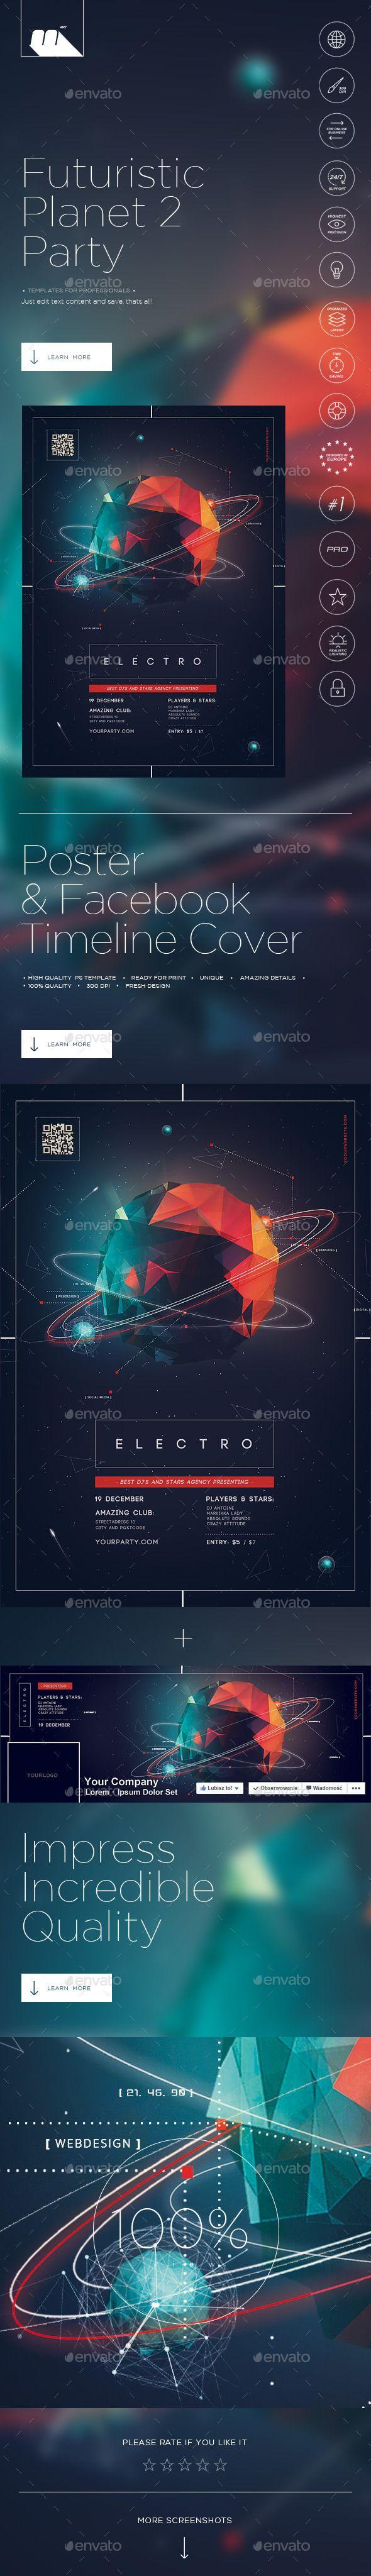 Futuristic Planet Party 2 Poster Tempalte #design Download: http://graphicriver.net/item/futuristic-planet-party-2-poster/12503527?ref=ksioks